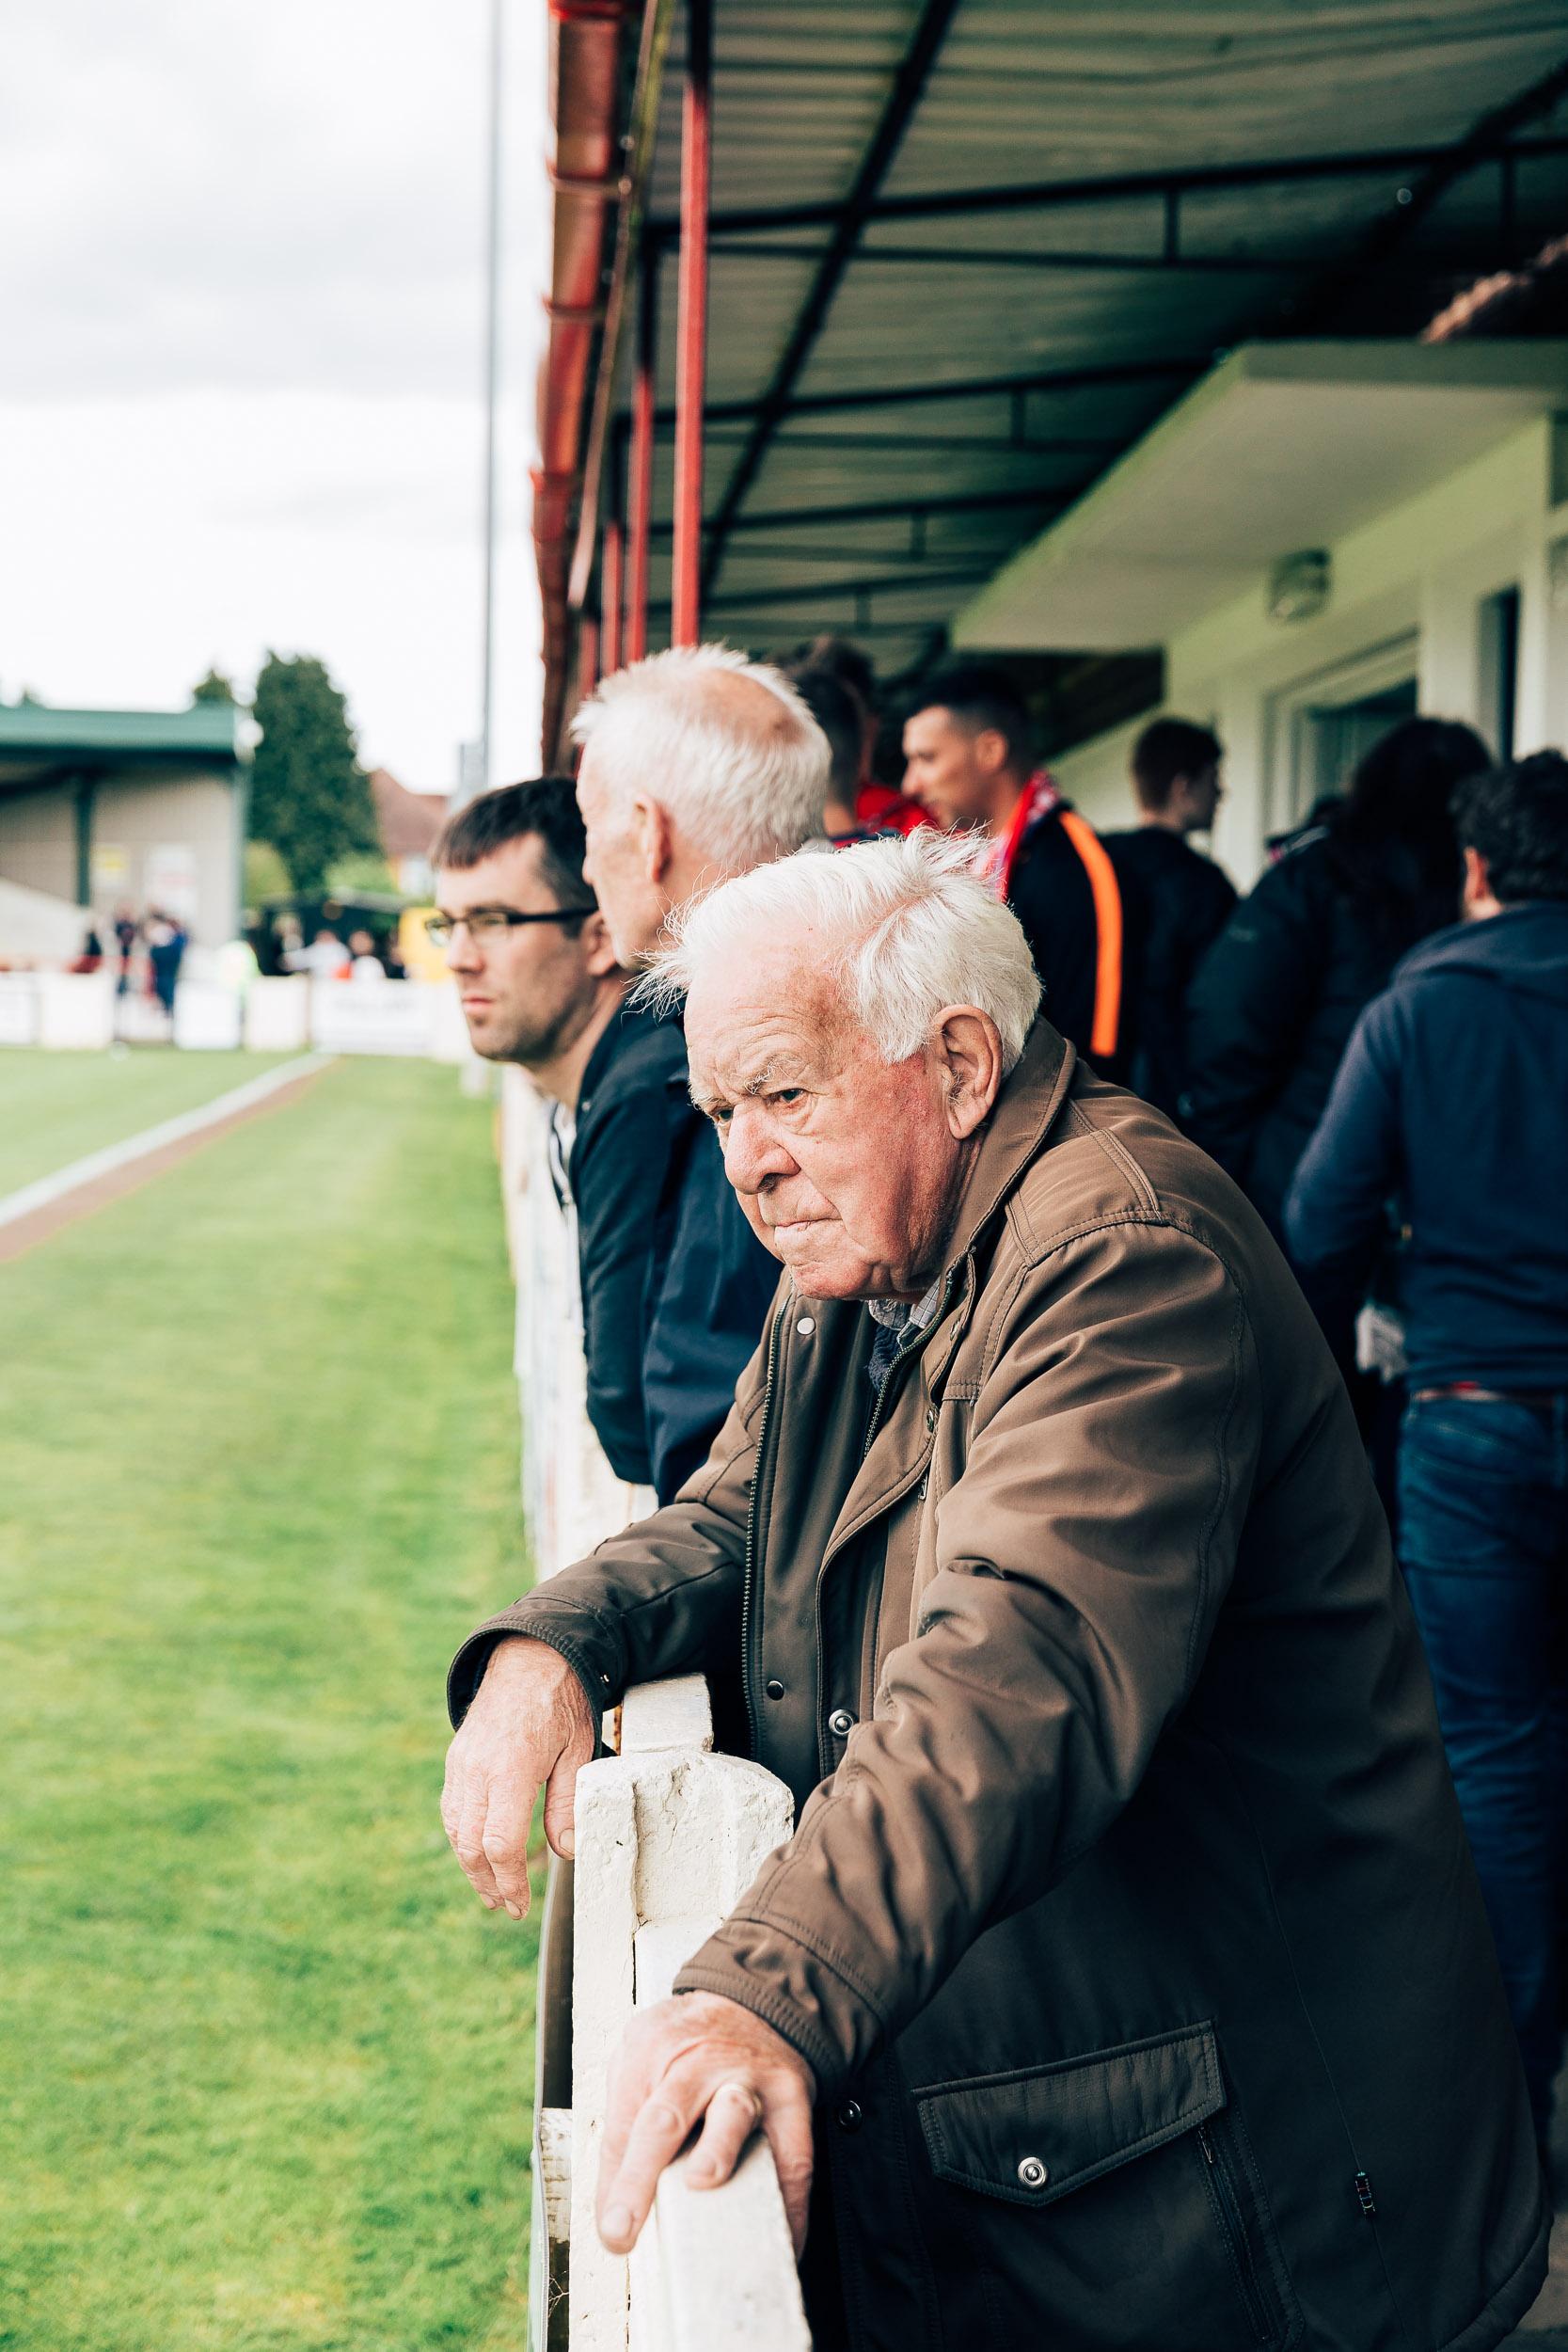 06_05_2019_Bromsgrove_Sporting_Corby-14.jpg